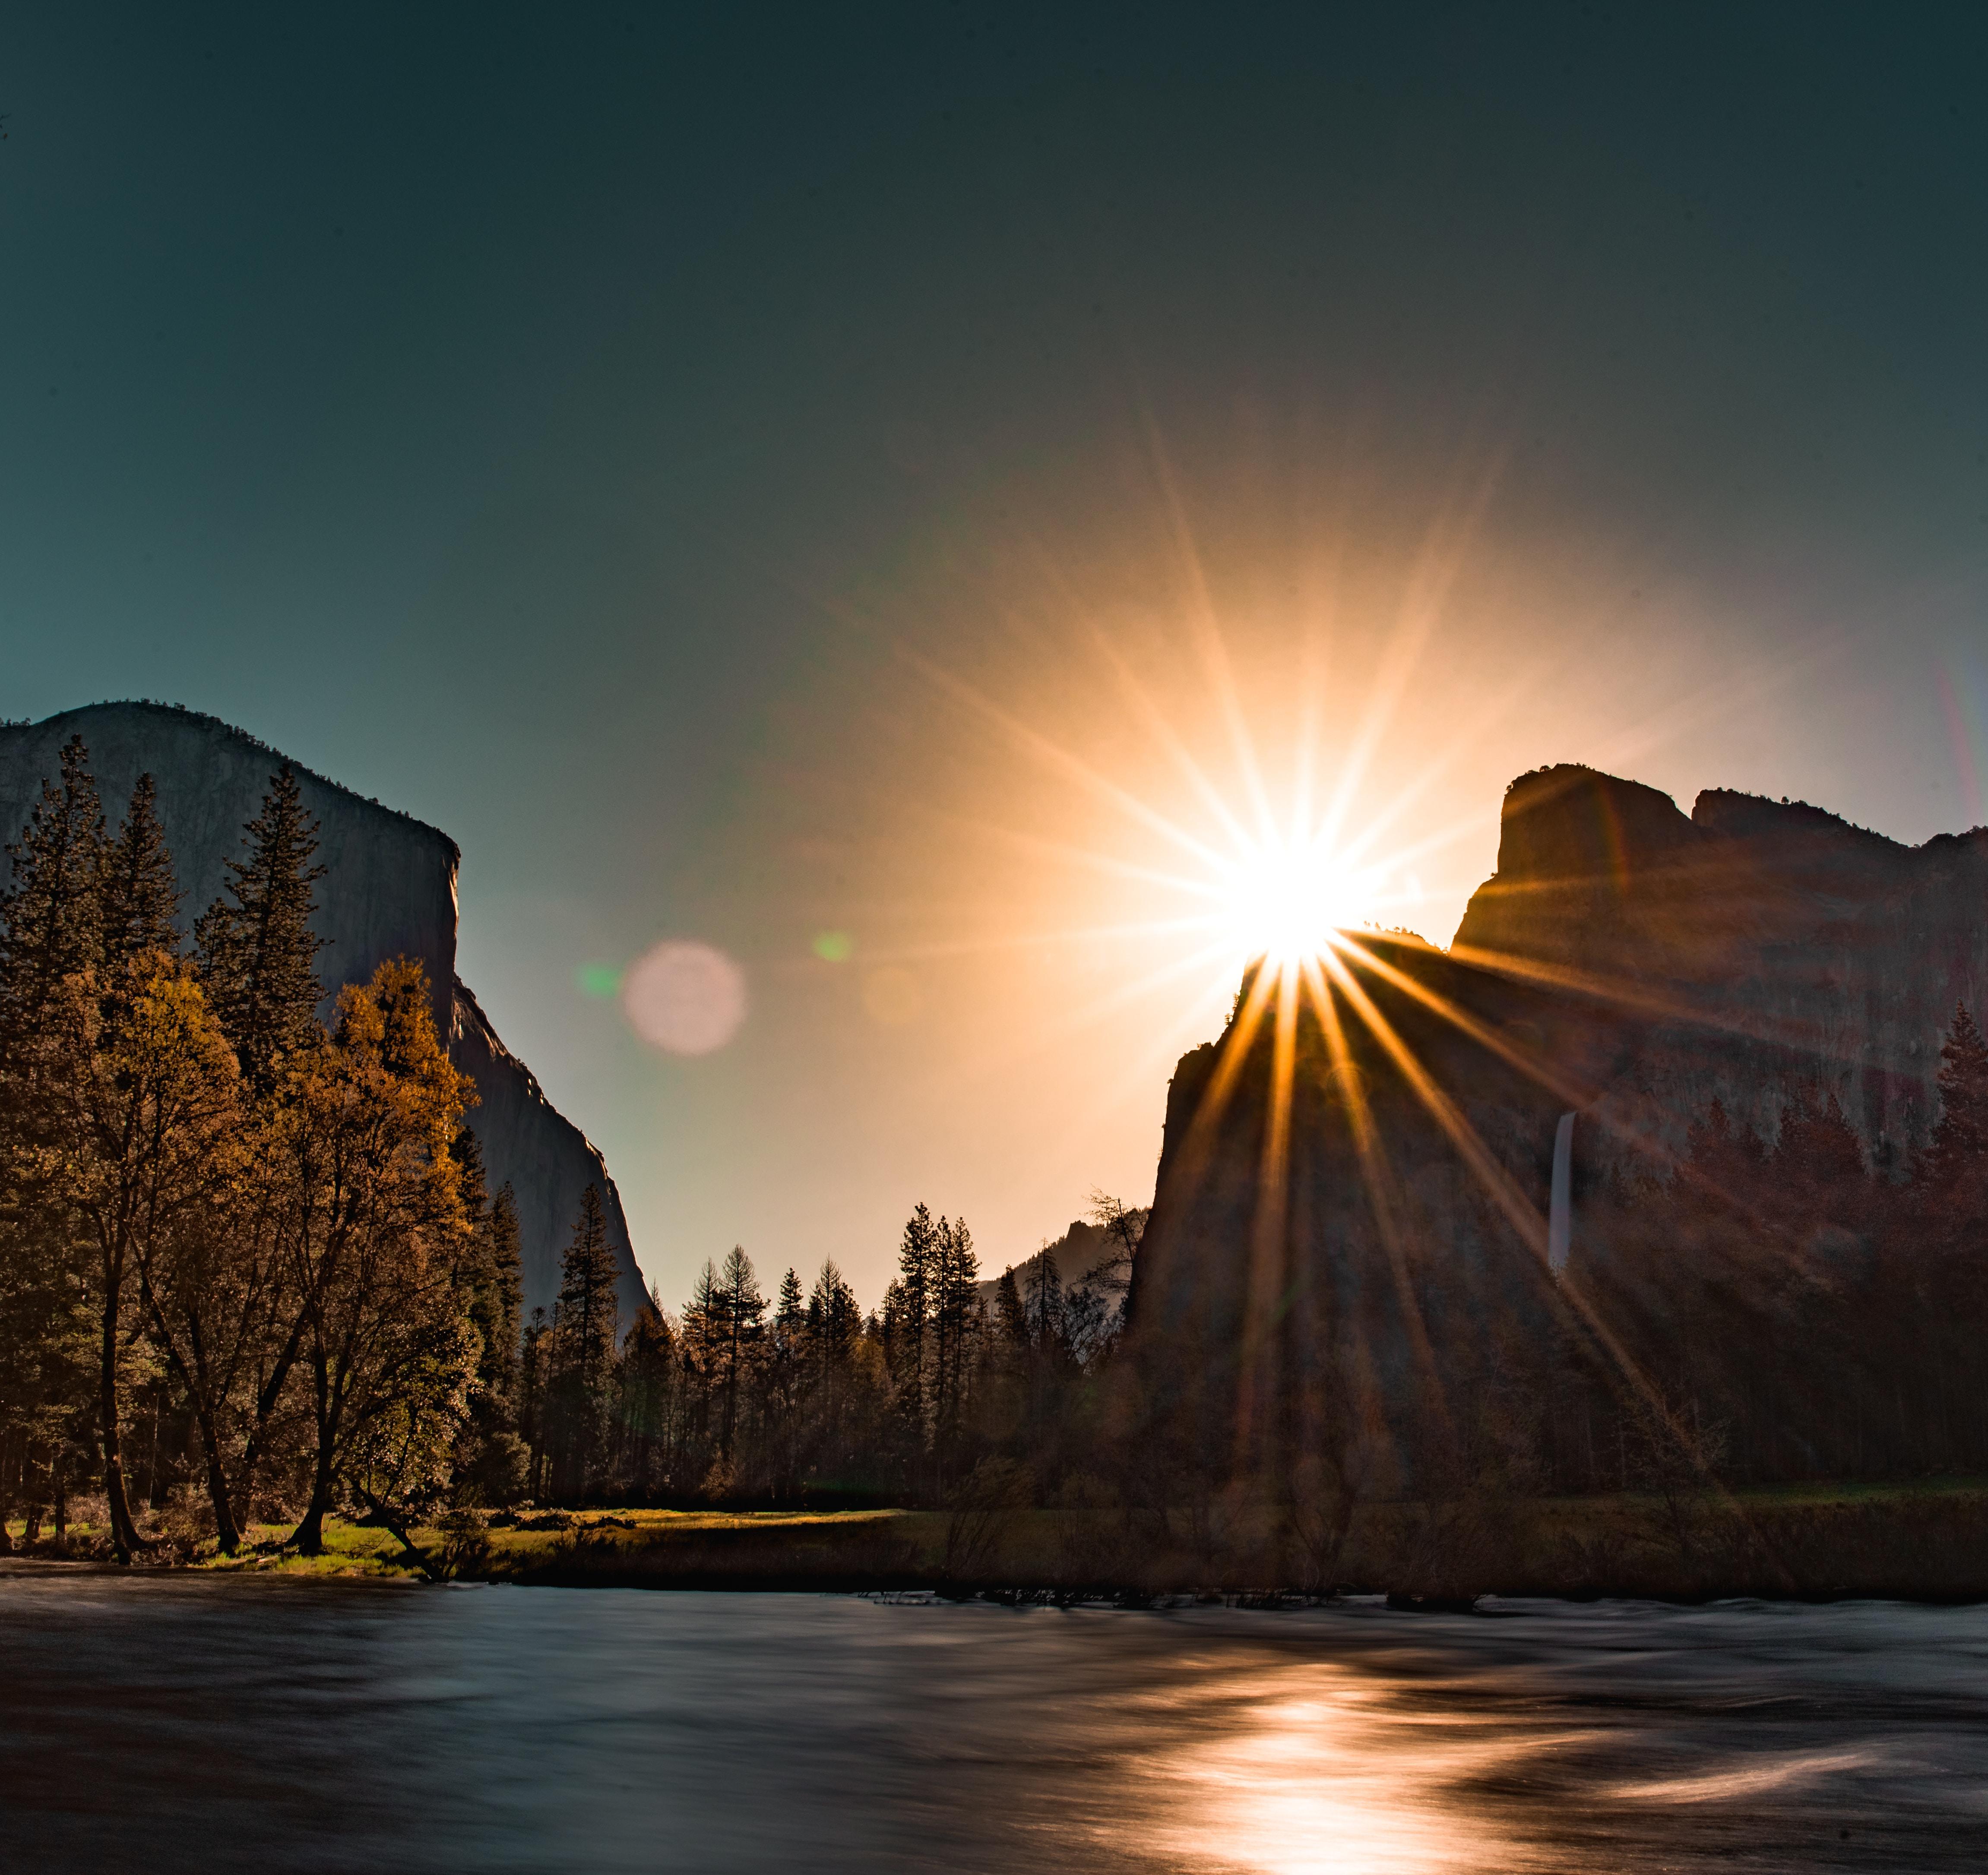 sunrise over mountains near river